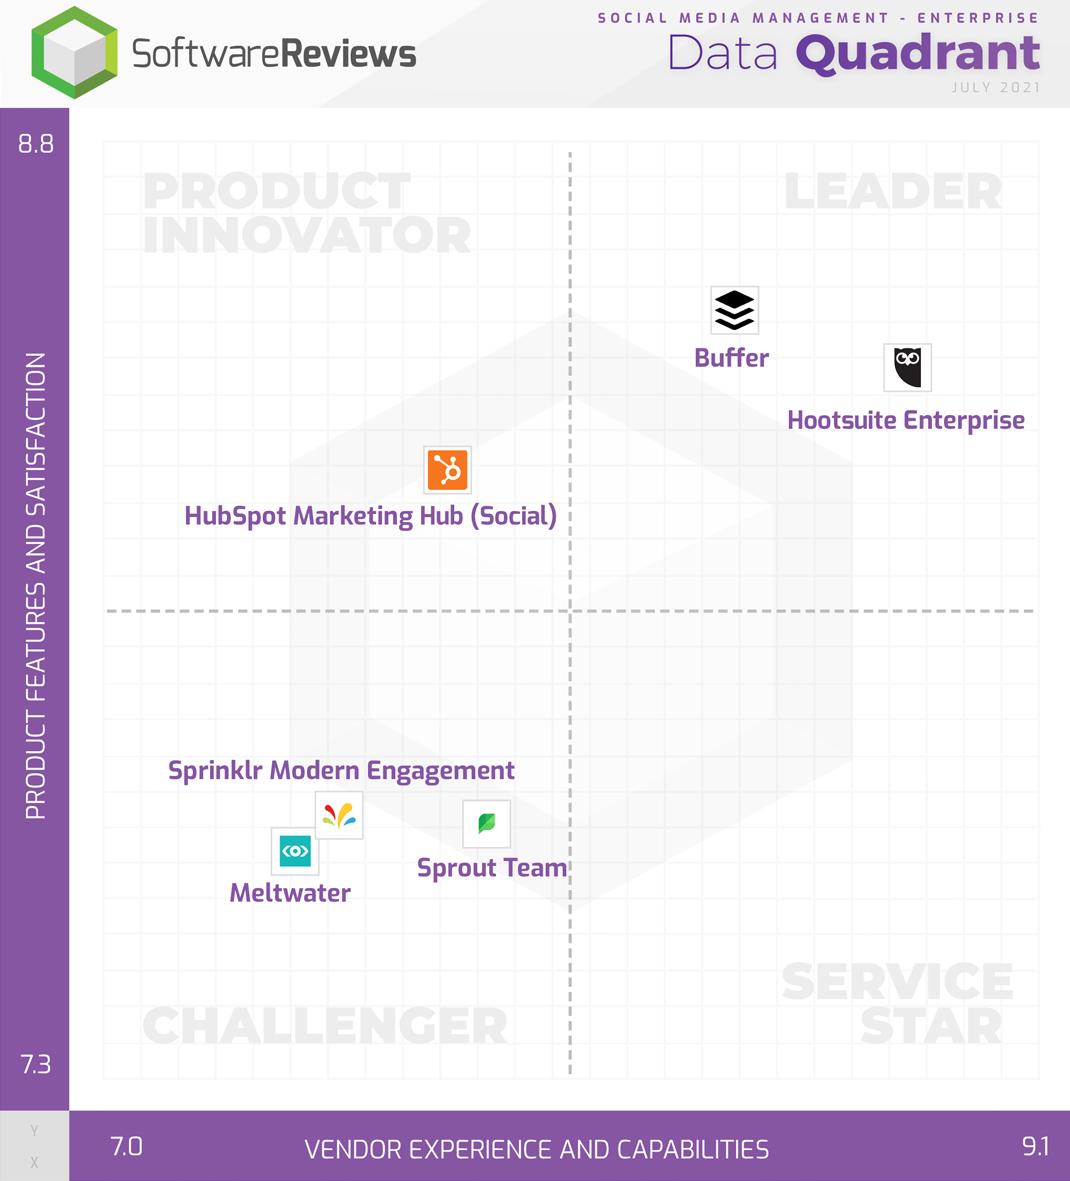 Social Media Management - Enterprise Data Quadrant